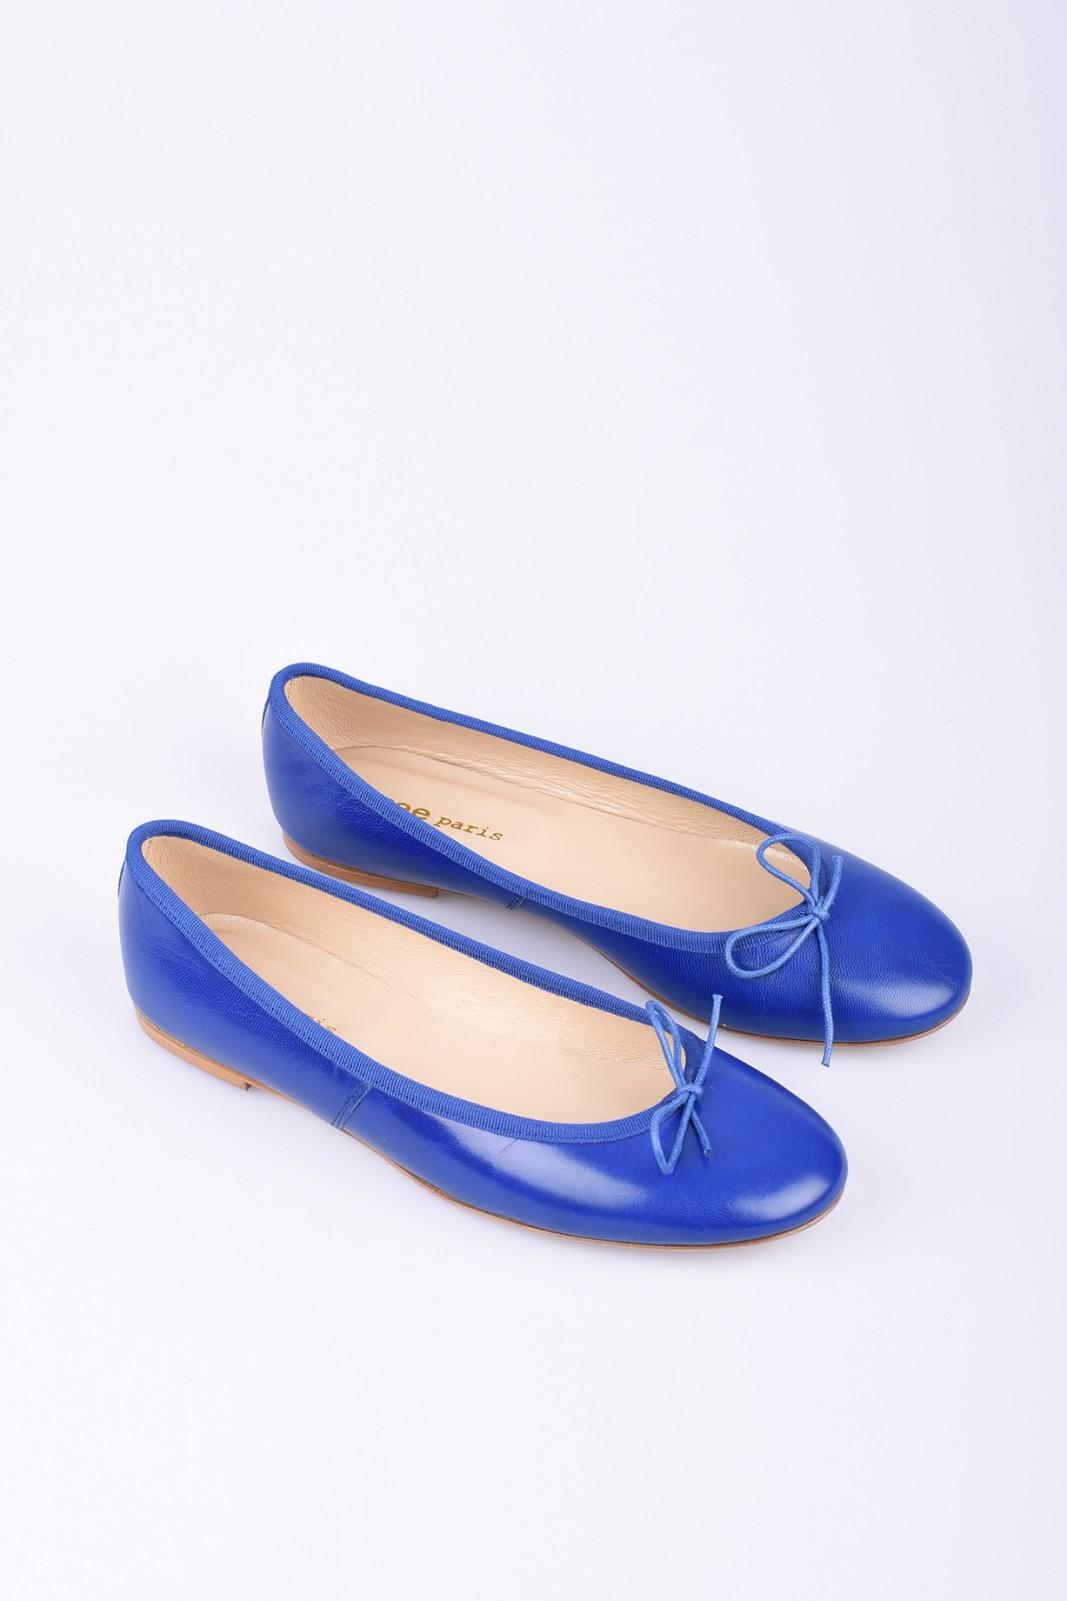 SPREE blue leather ballerinas